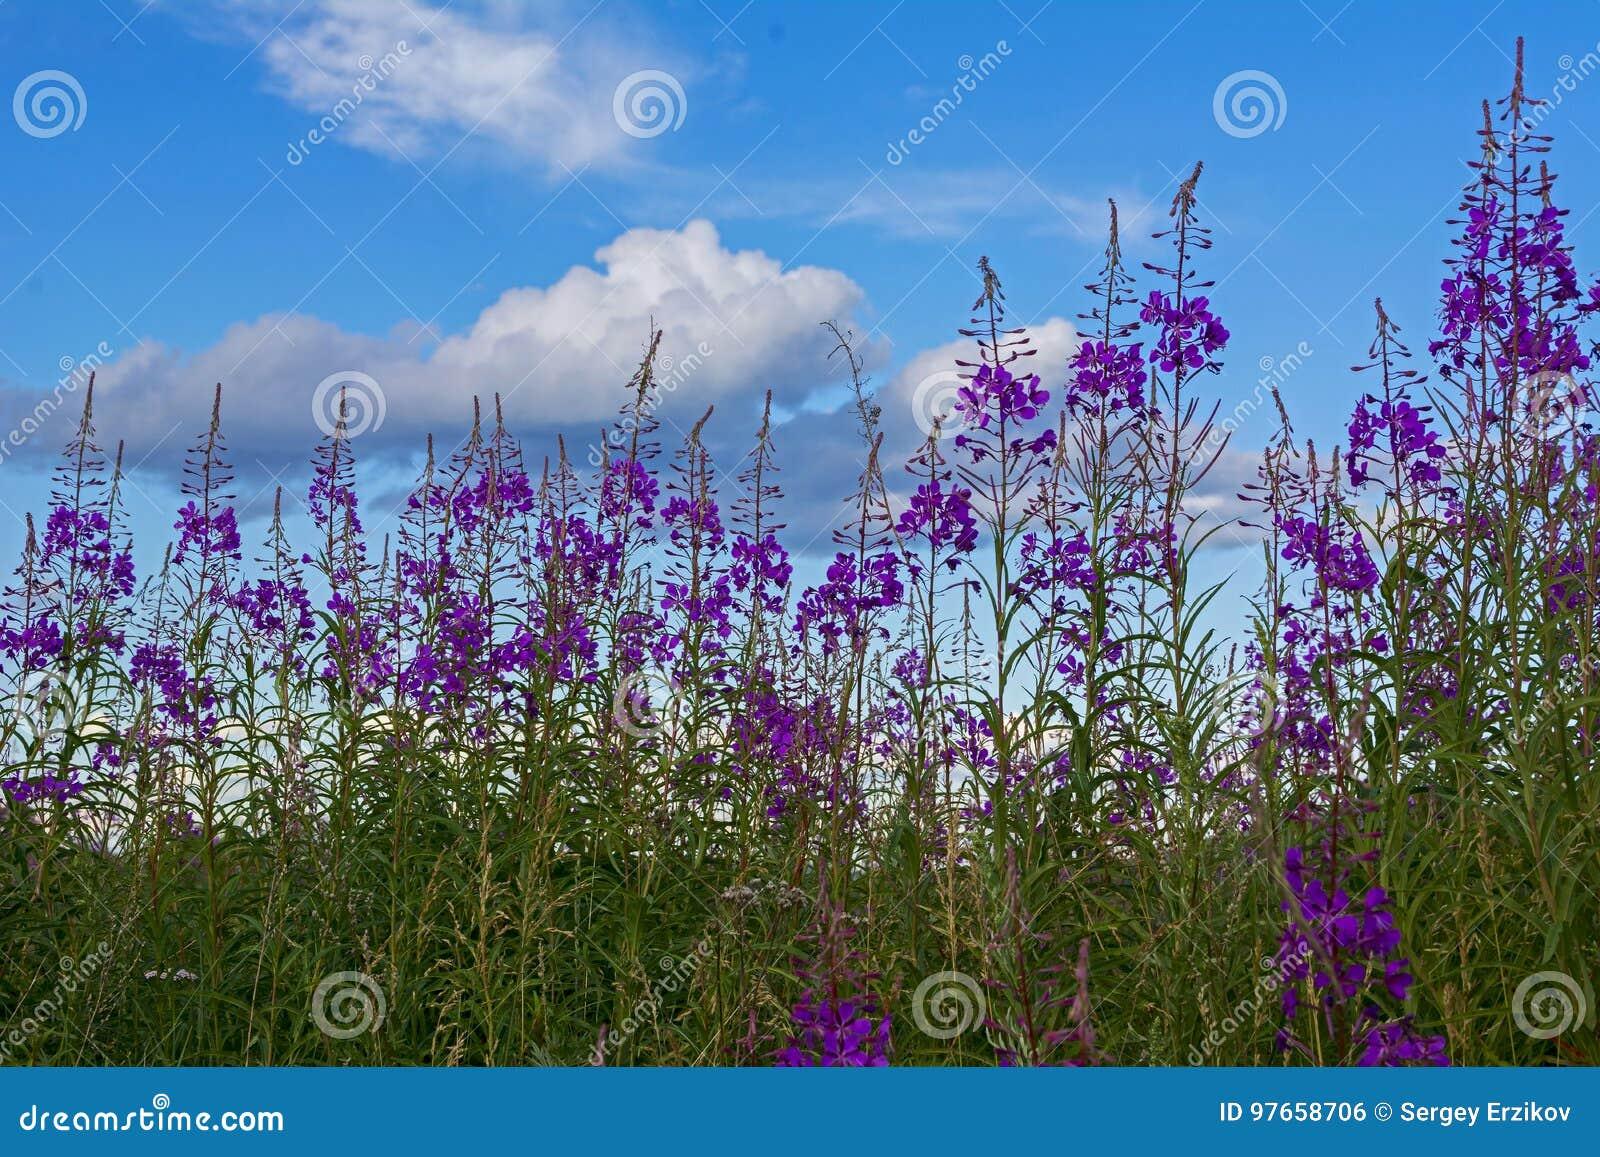 Koporye Tea Flowers And Blue Sky With White Clouds Like Wads Of